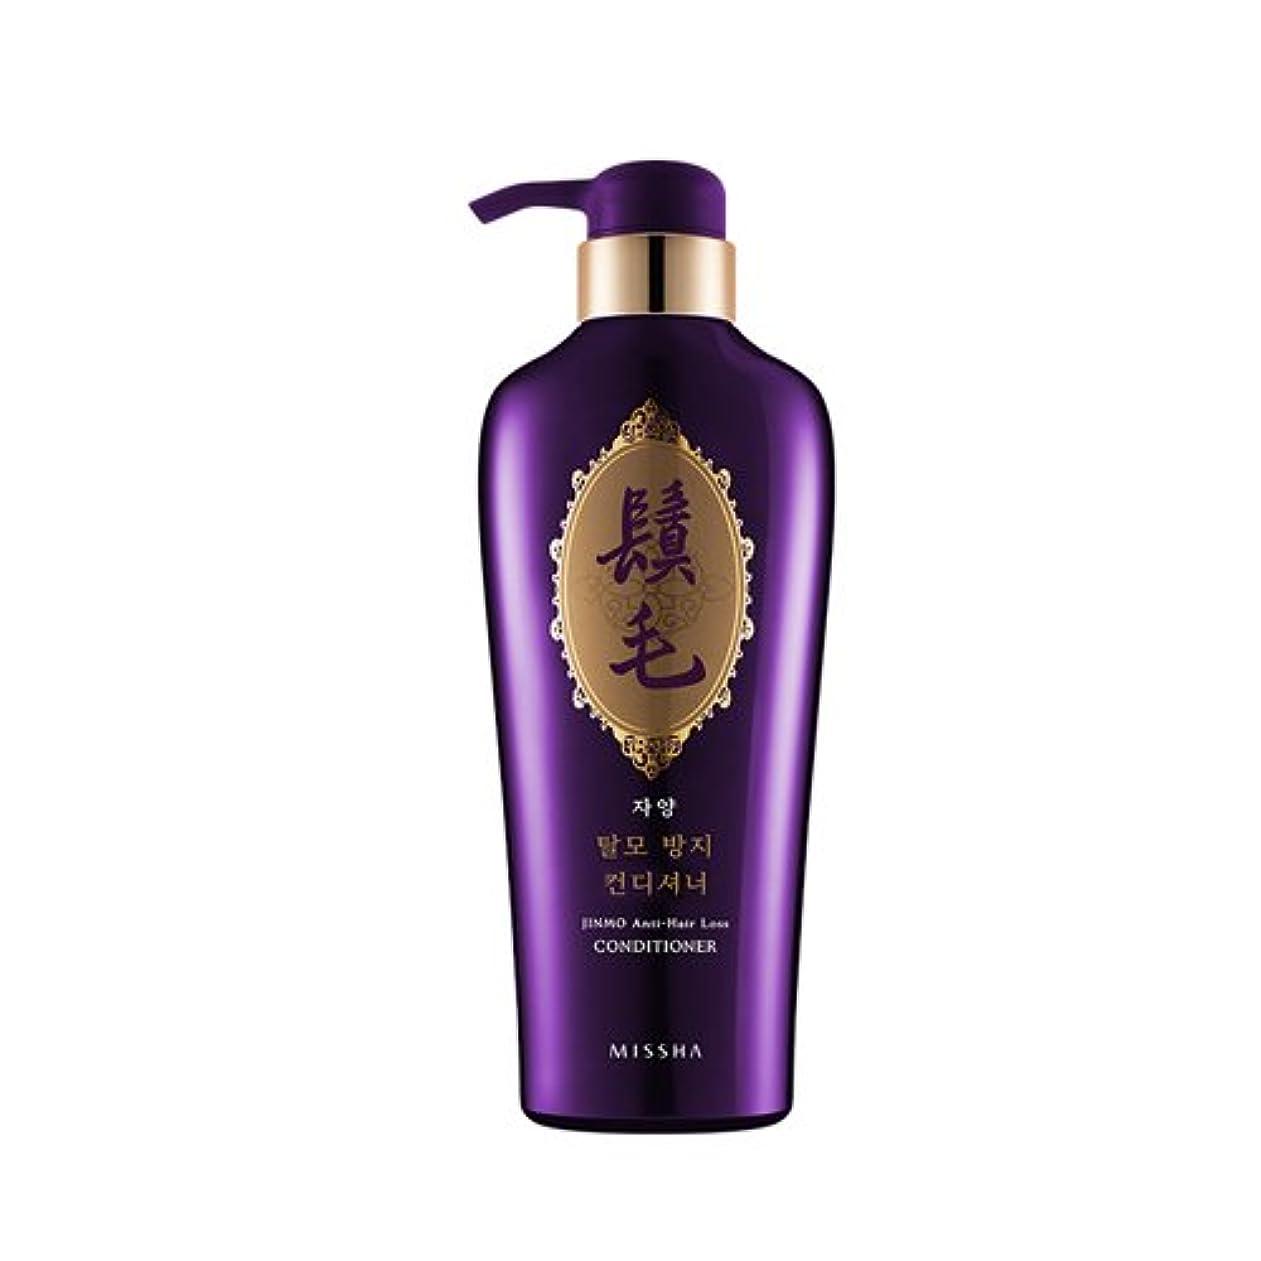 MISSHA JINMO Anti-hair Loss CONDITIONER 400ml ミシャ ジンモ 脱毛防止 コンディショナー 400ml [並行輸入品]